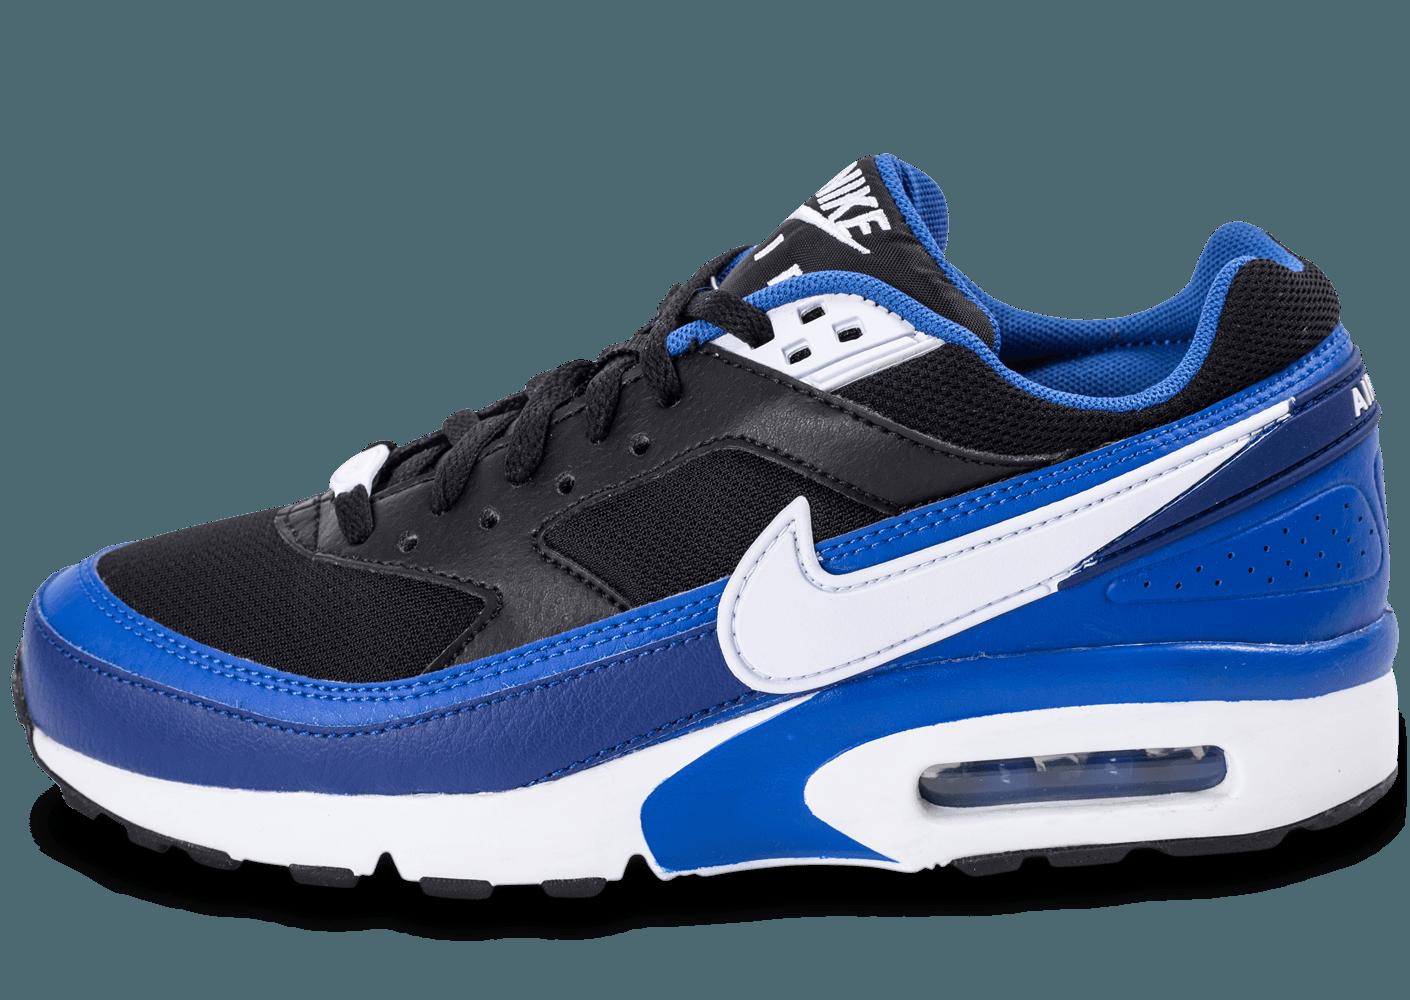 Soldes Nike Air Max Classic BW Homme Noir Blanche Lumière